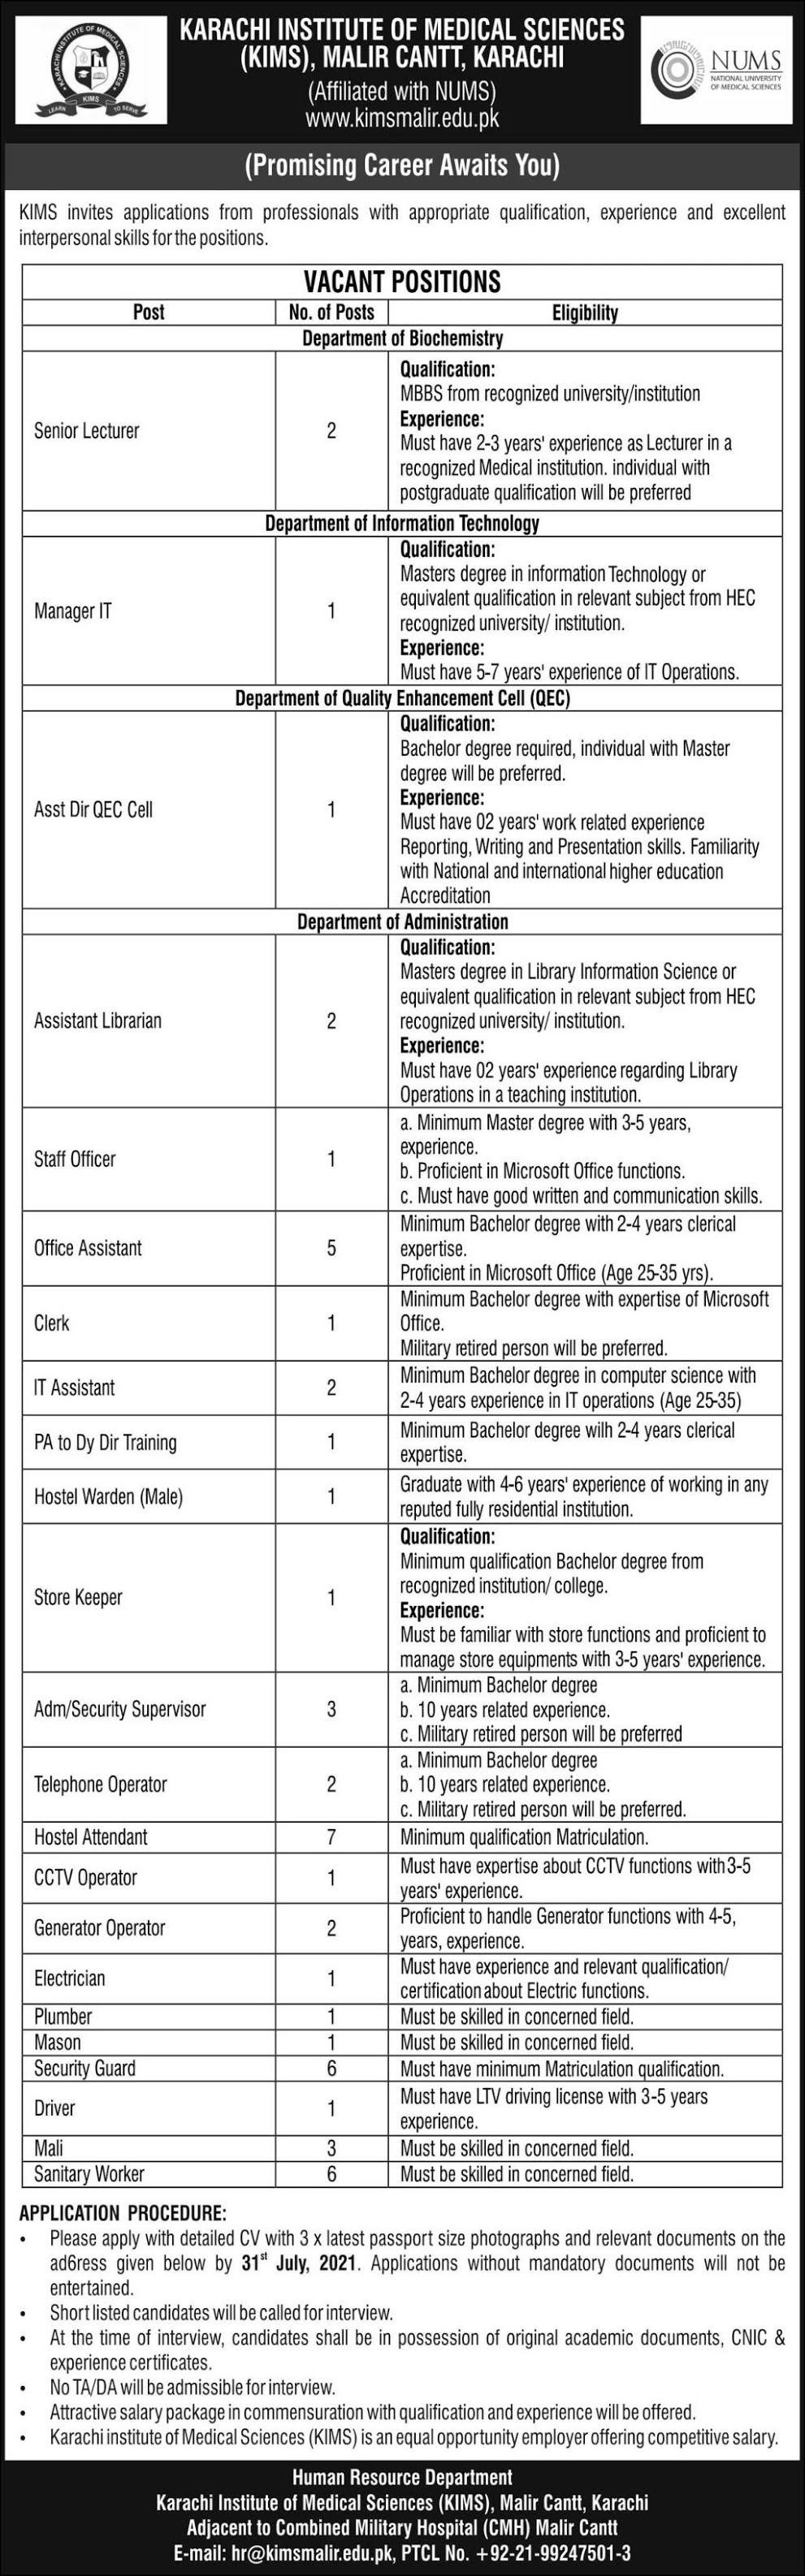 www.kimsmalir.edu.pk Jobs 2021 - Karachi Institute Of Medical Sciences (KIMS) Jobs 2021 in Pakistan